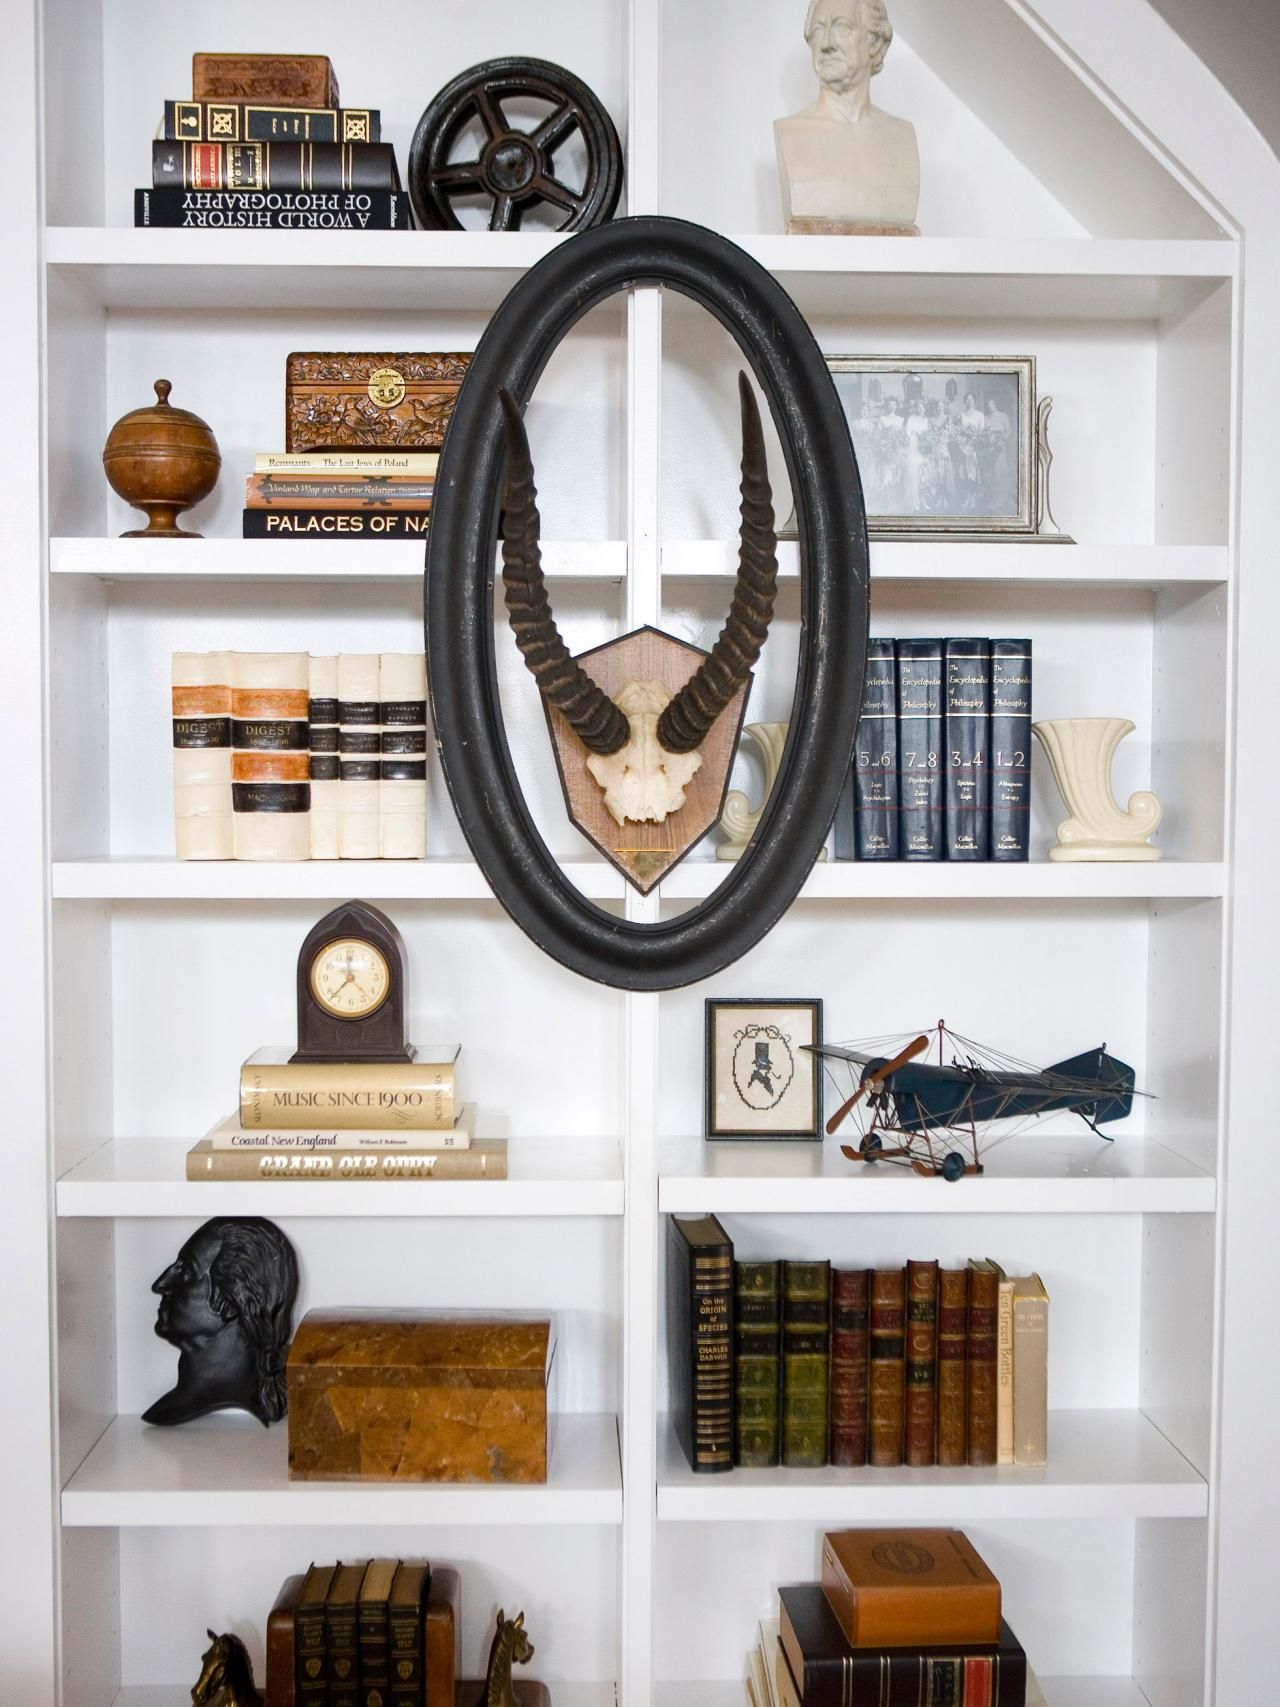 Bookshelf and Wall Shelf Decorating Ideas